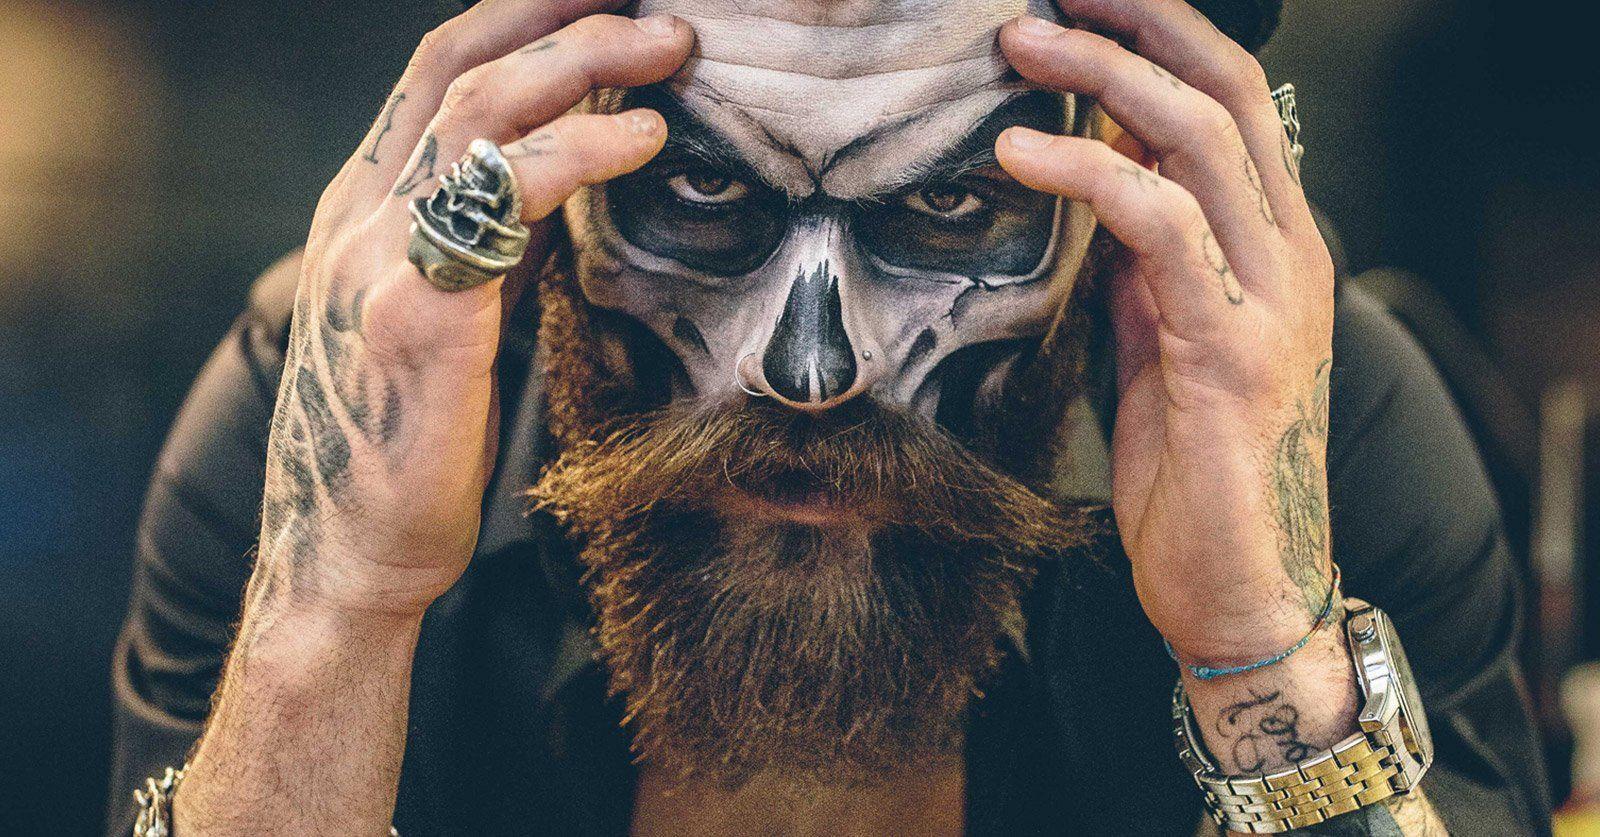 10 TOP Halloween Costume Ideas for Men with Beards Top